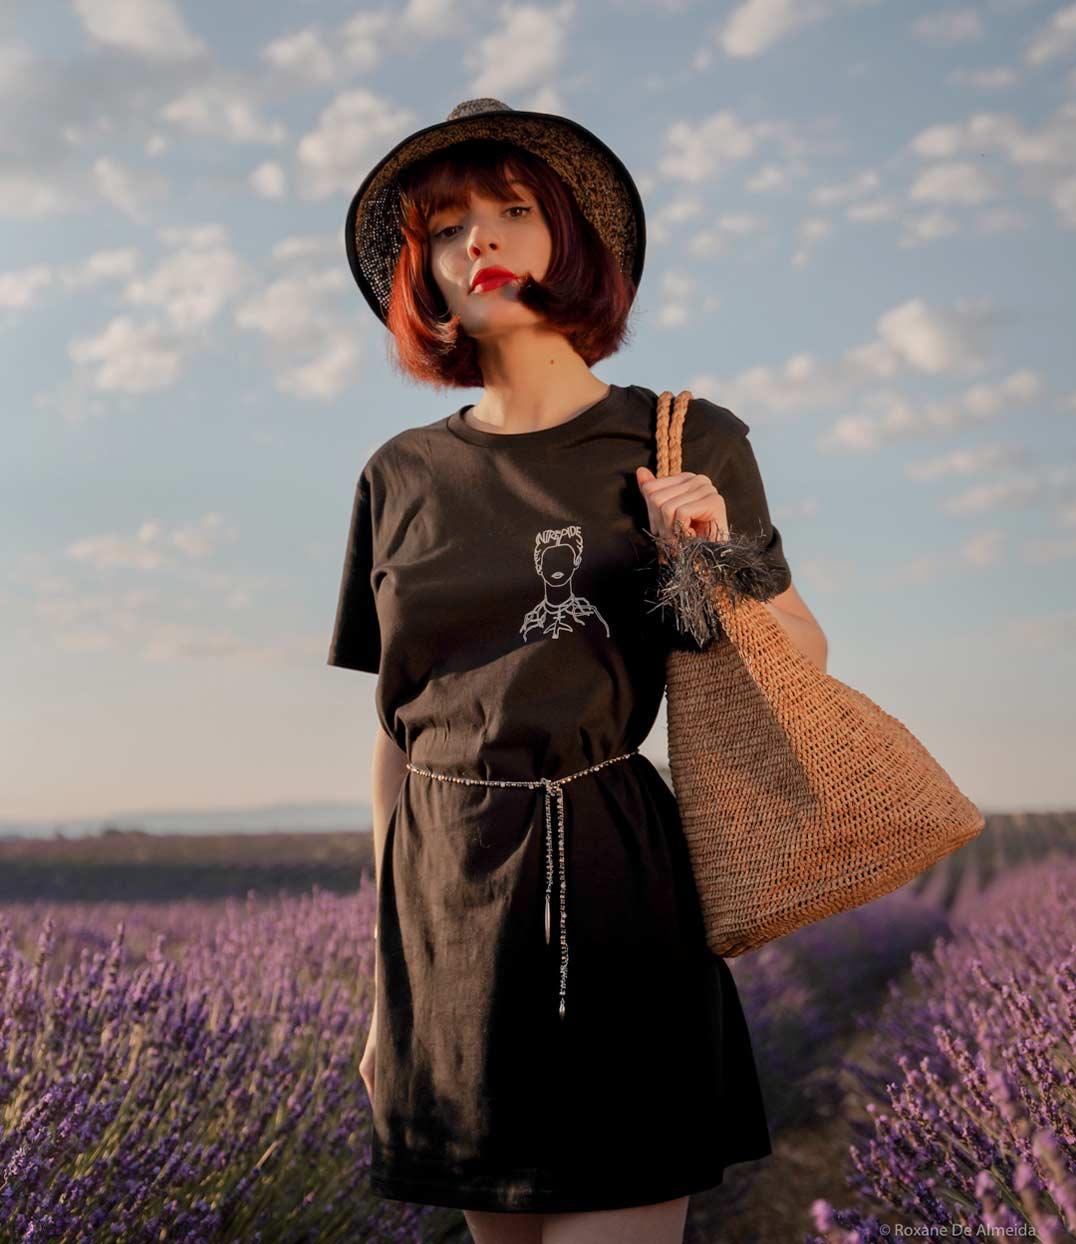 Femme qui porte robe frida noire Leonor Roversi dans un champ de lavande